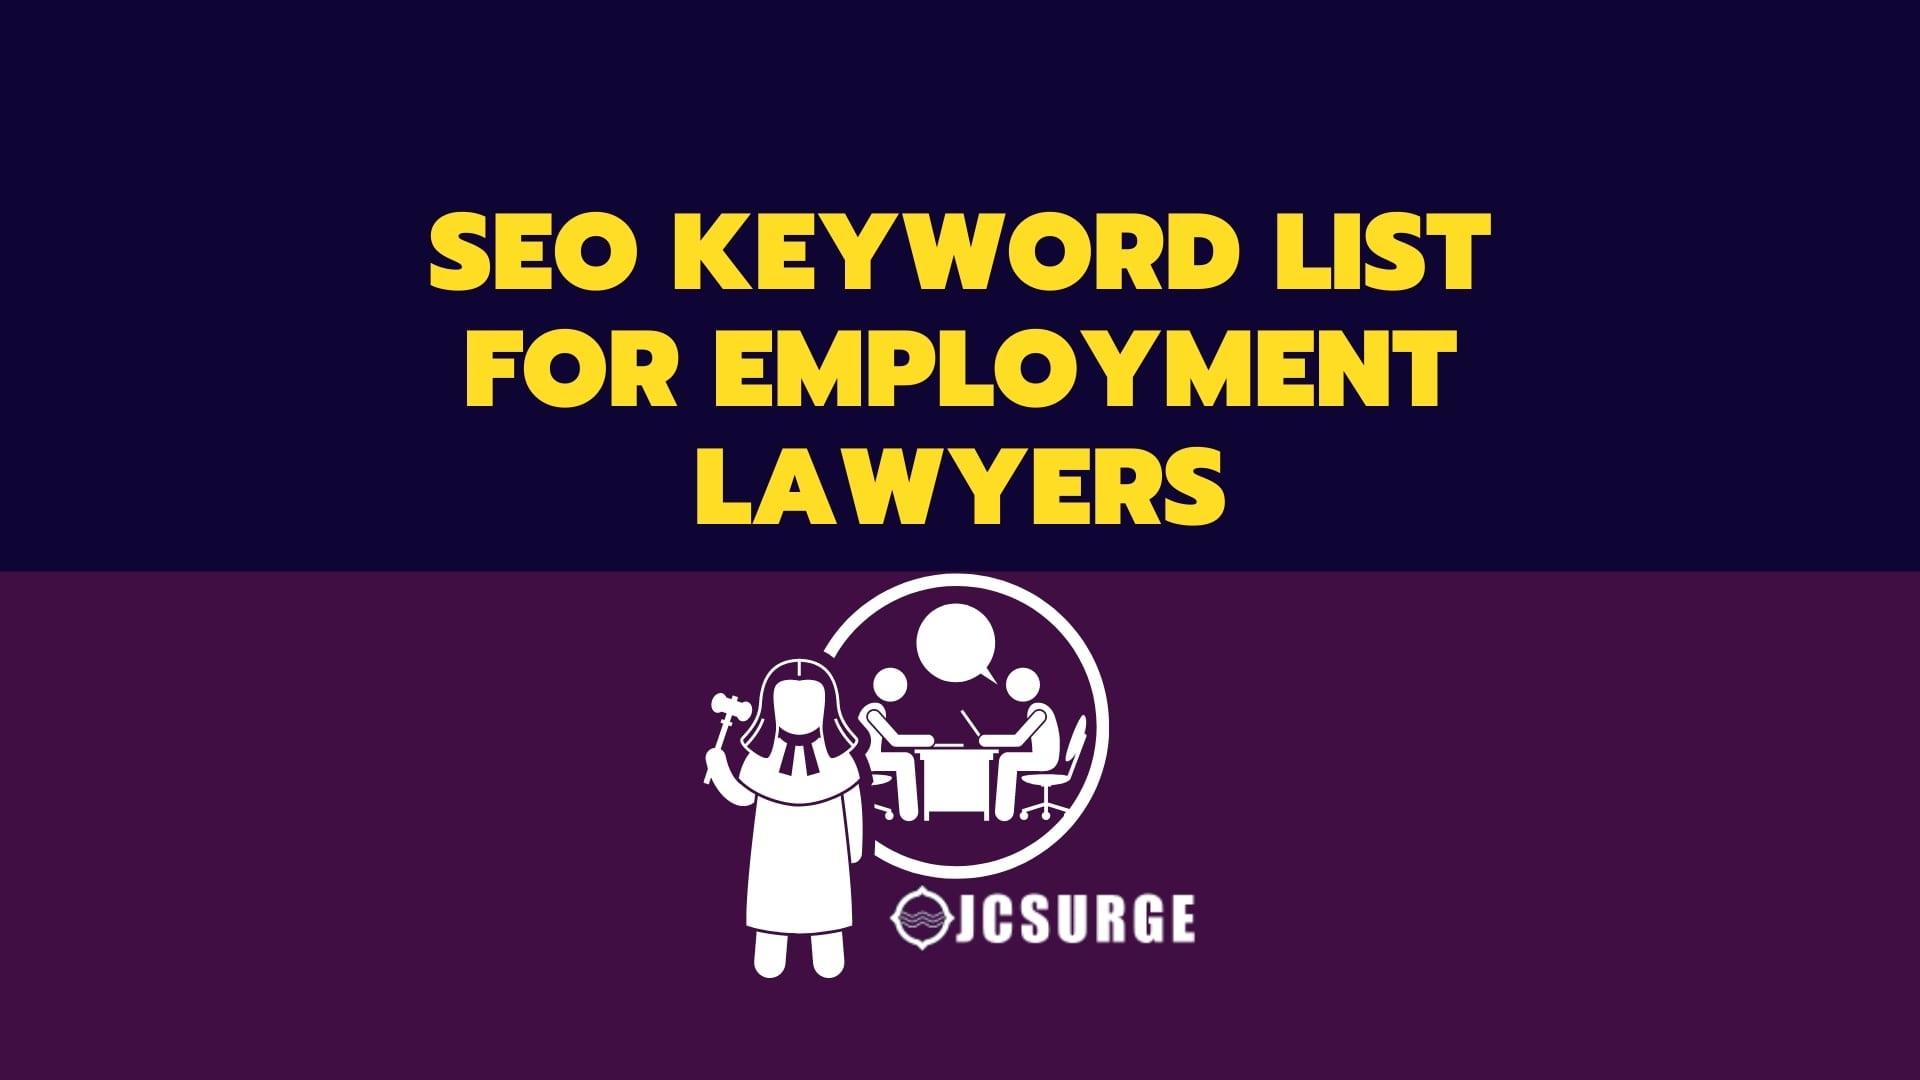 SEO KEYWORD LIST FOR EMPLOYMENT LAWYERS_